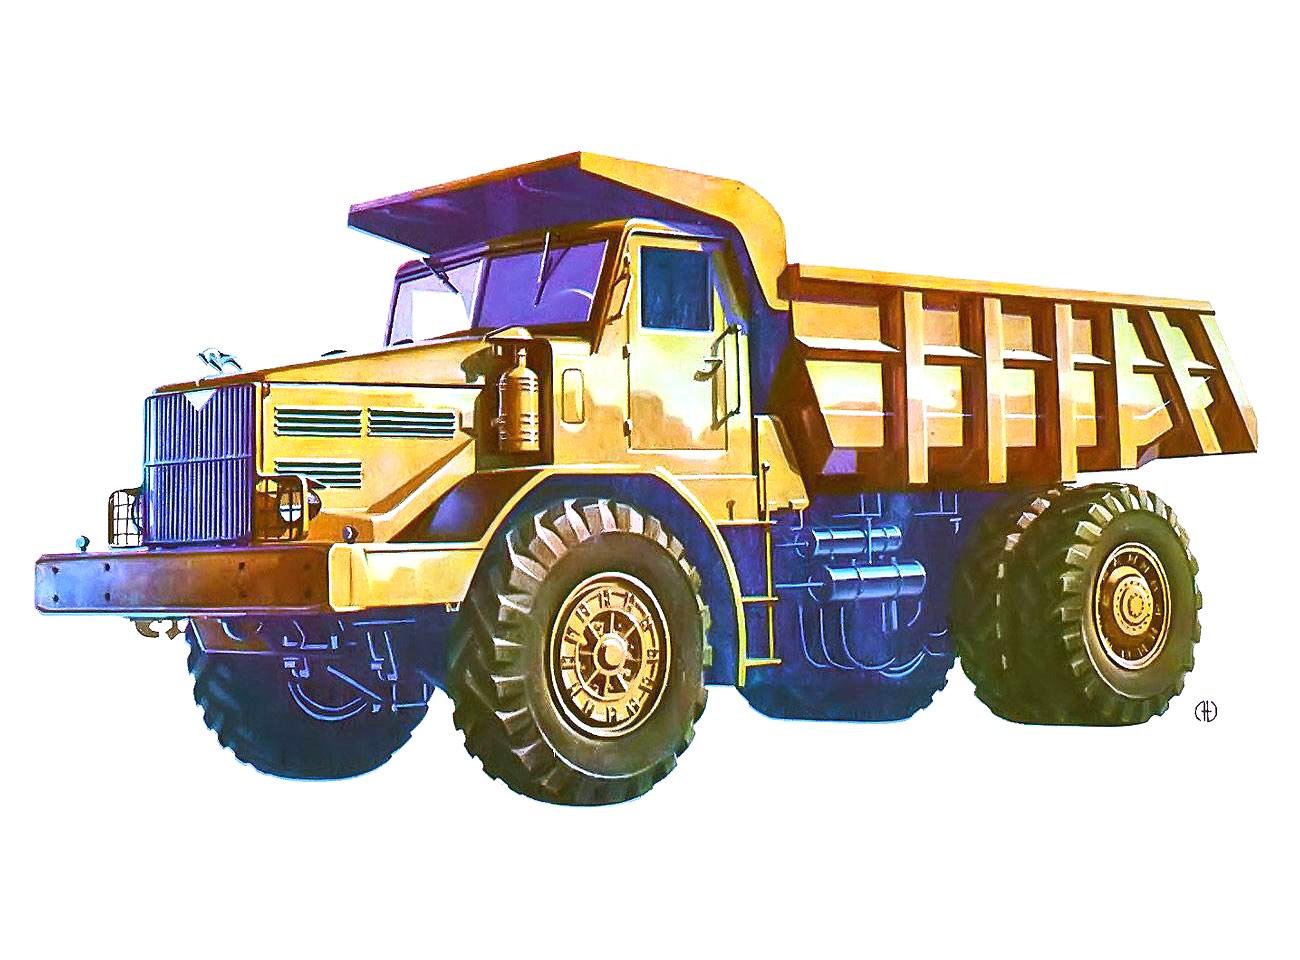 1950-1959. MAZ-525